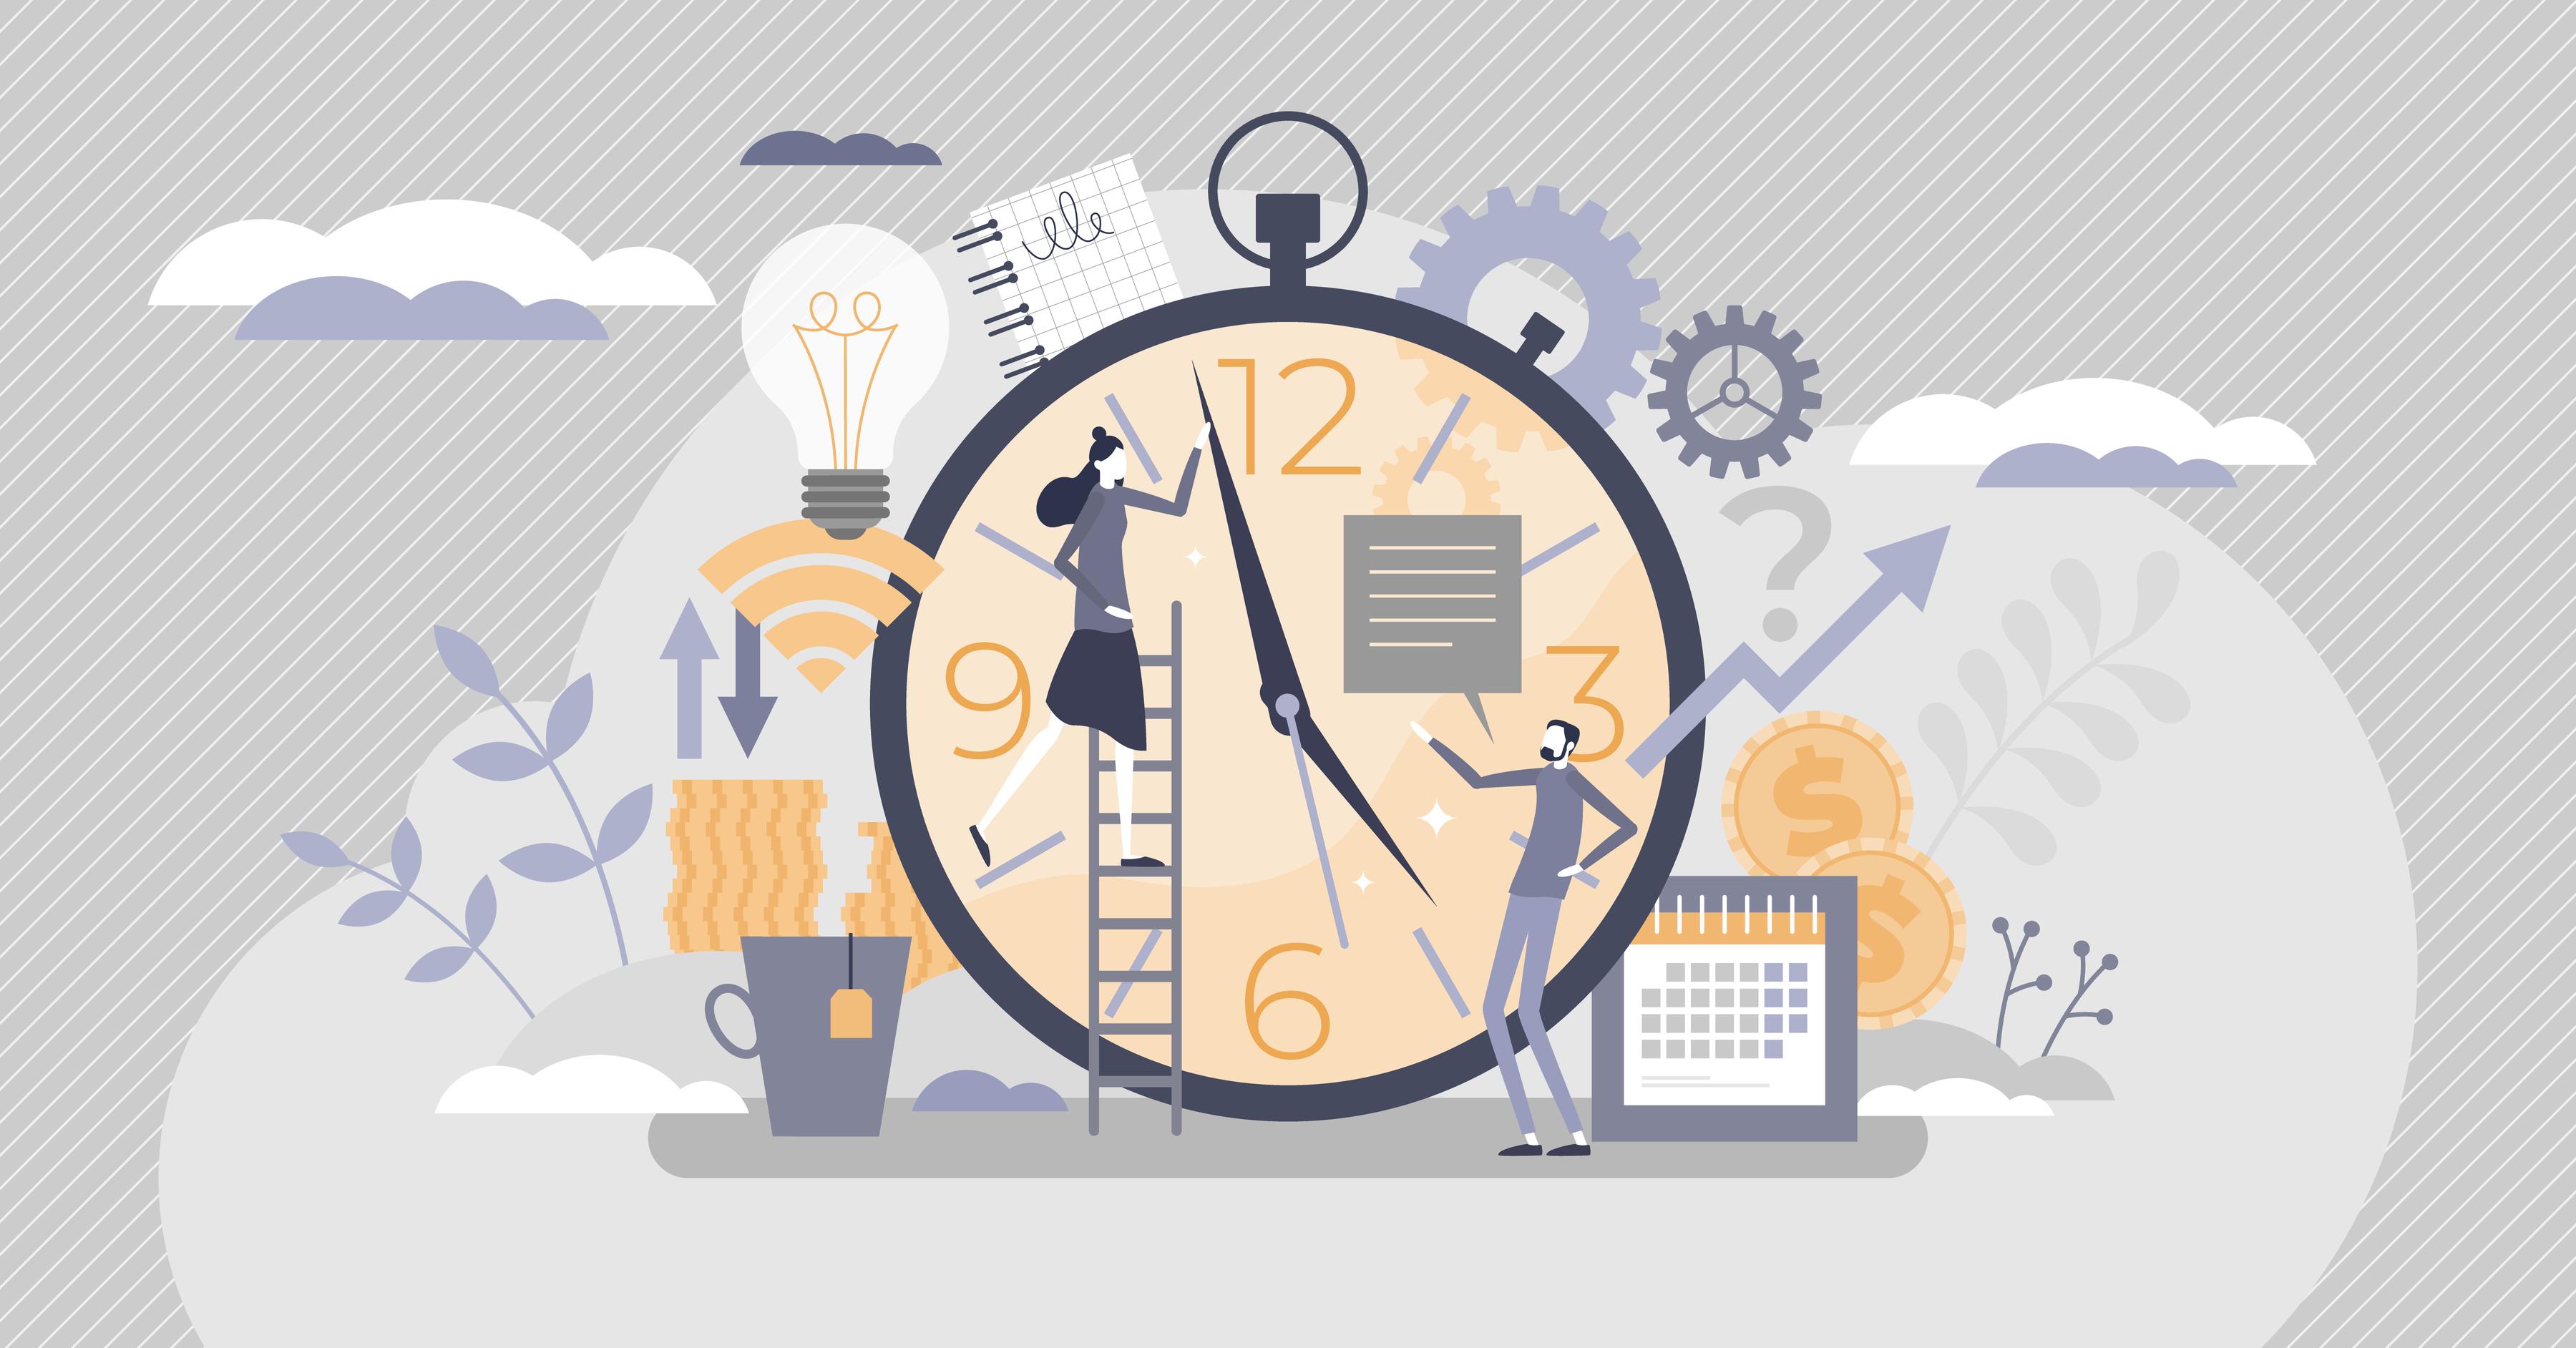 Illustration conveying deadlines